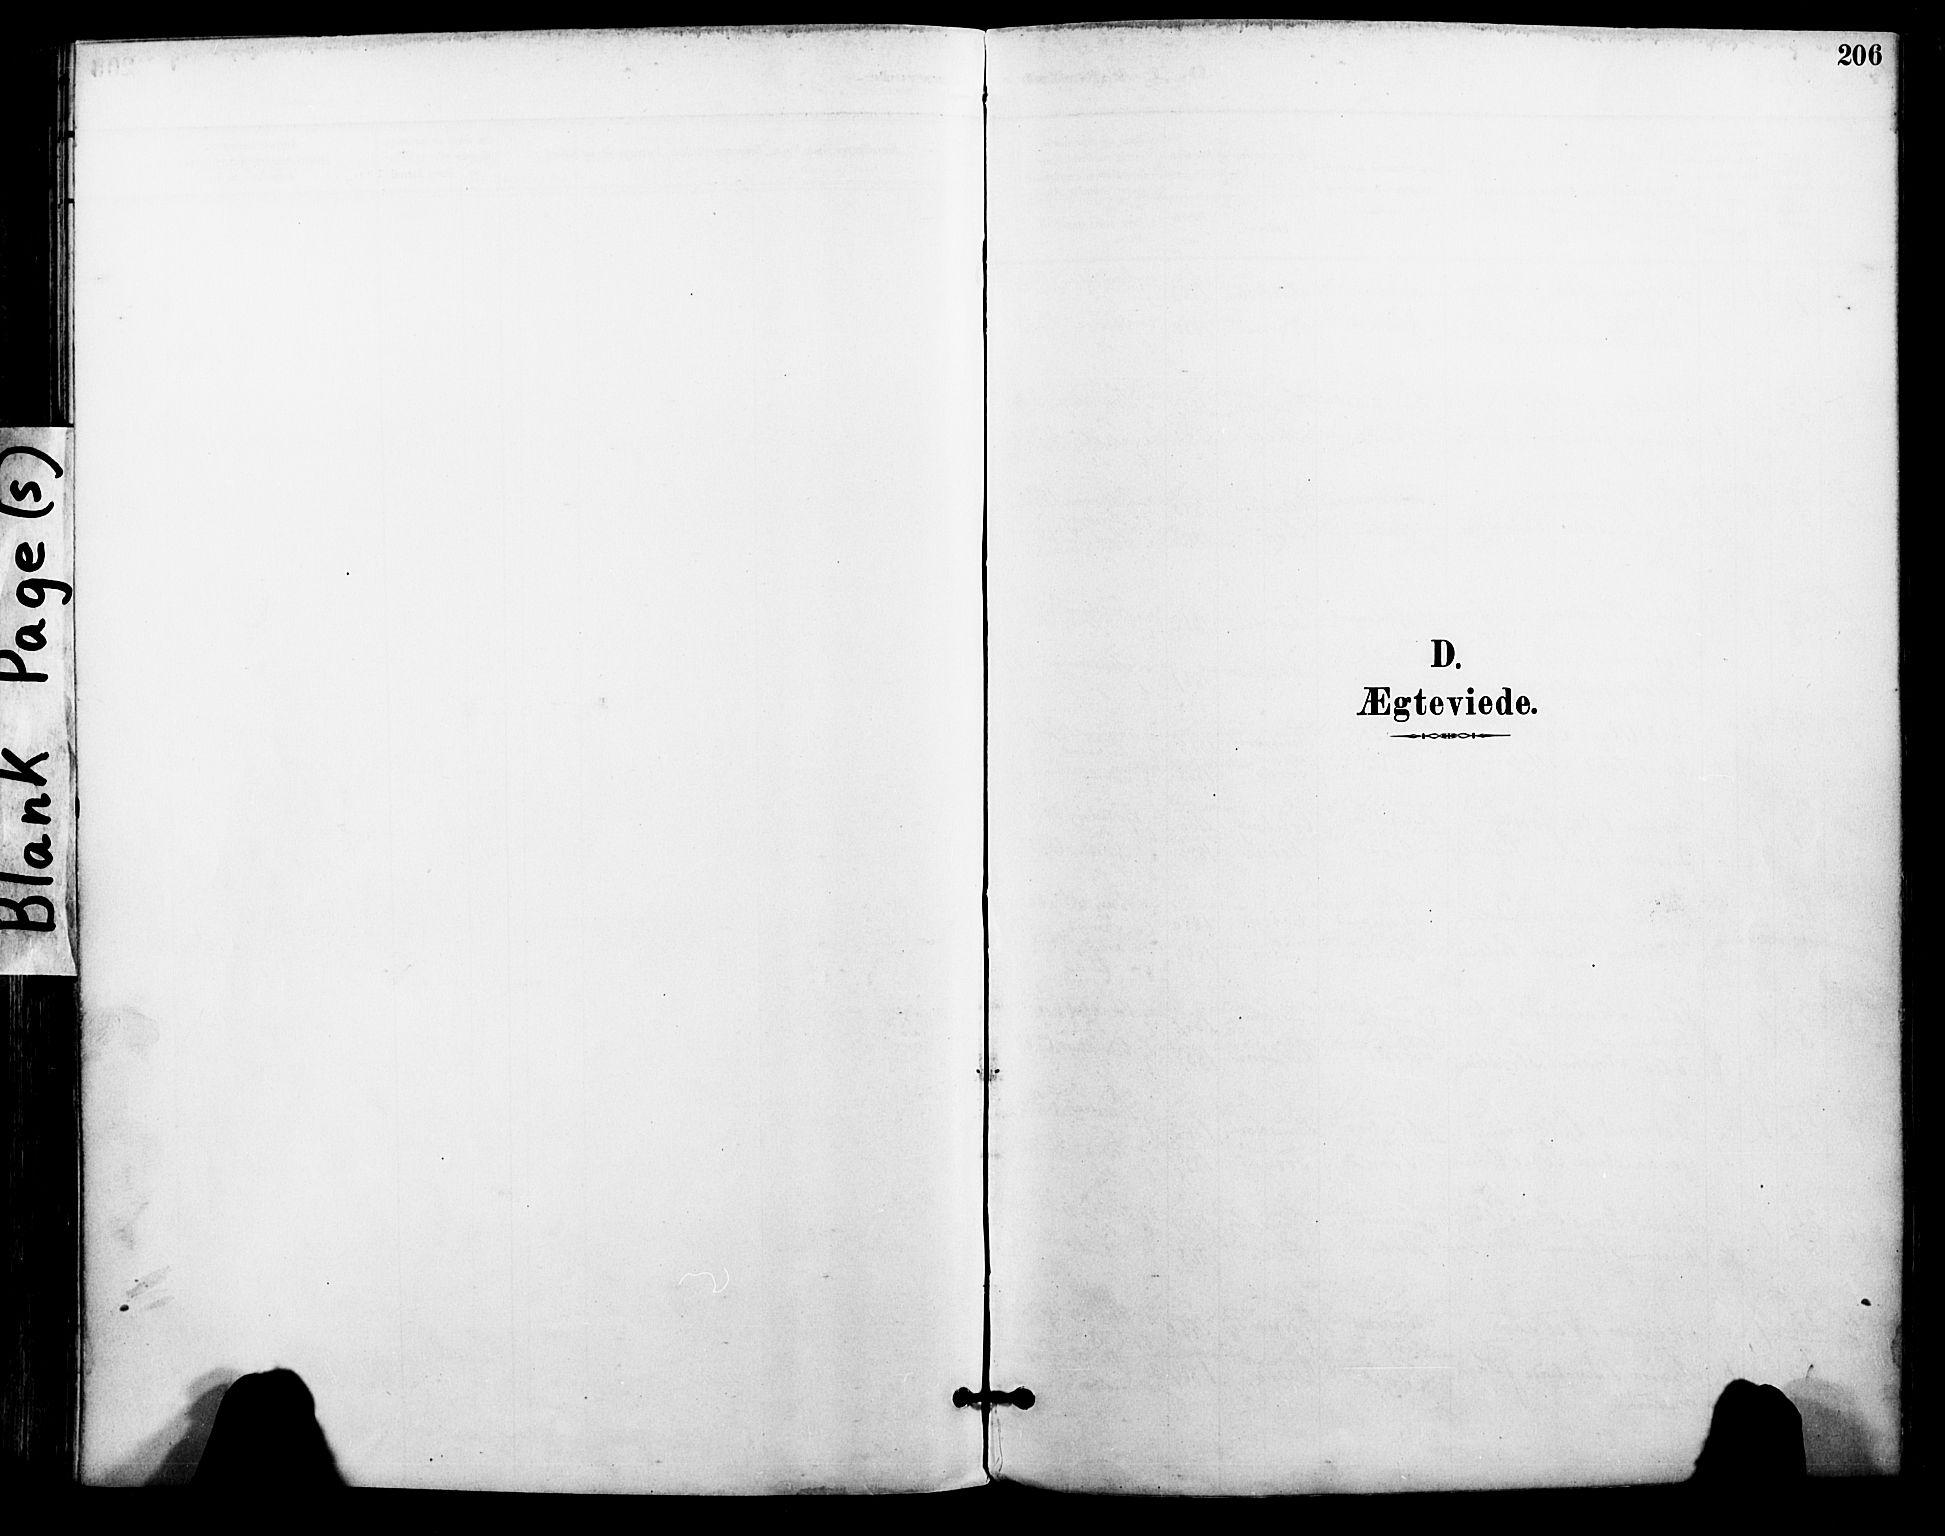 SAT, Ministerialprotokoller, klokkerbøker og fødselsregistre - Nordland, 801/L0010: Ministerialbok nr. 801A10, 1888-1899, s. 206